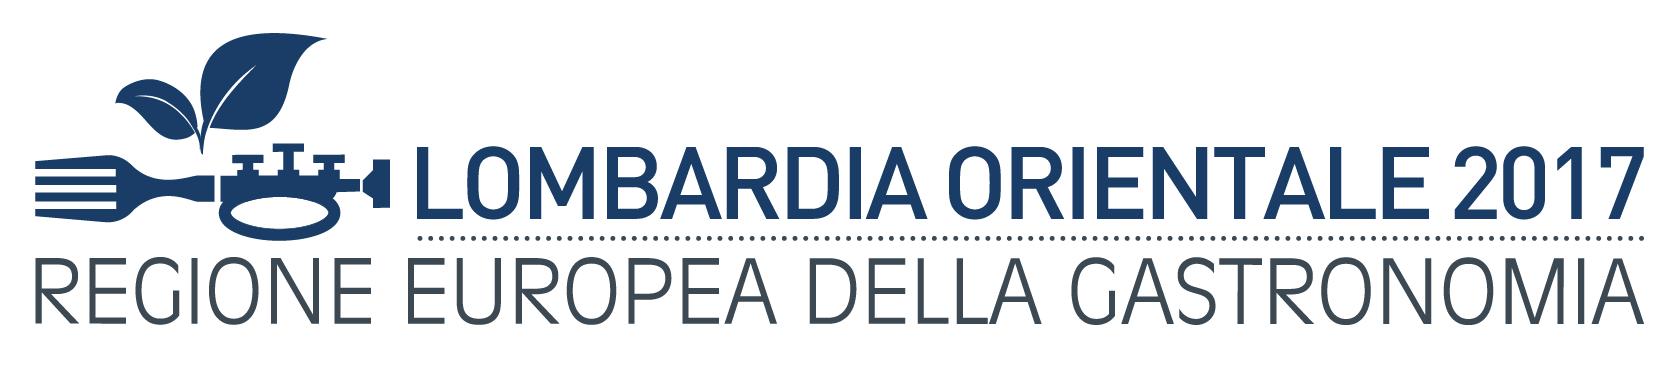 Logo ERG Lombardia Orientale